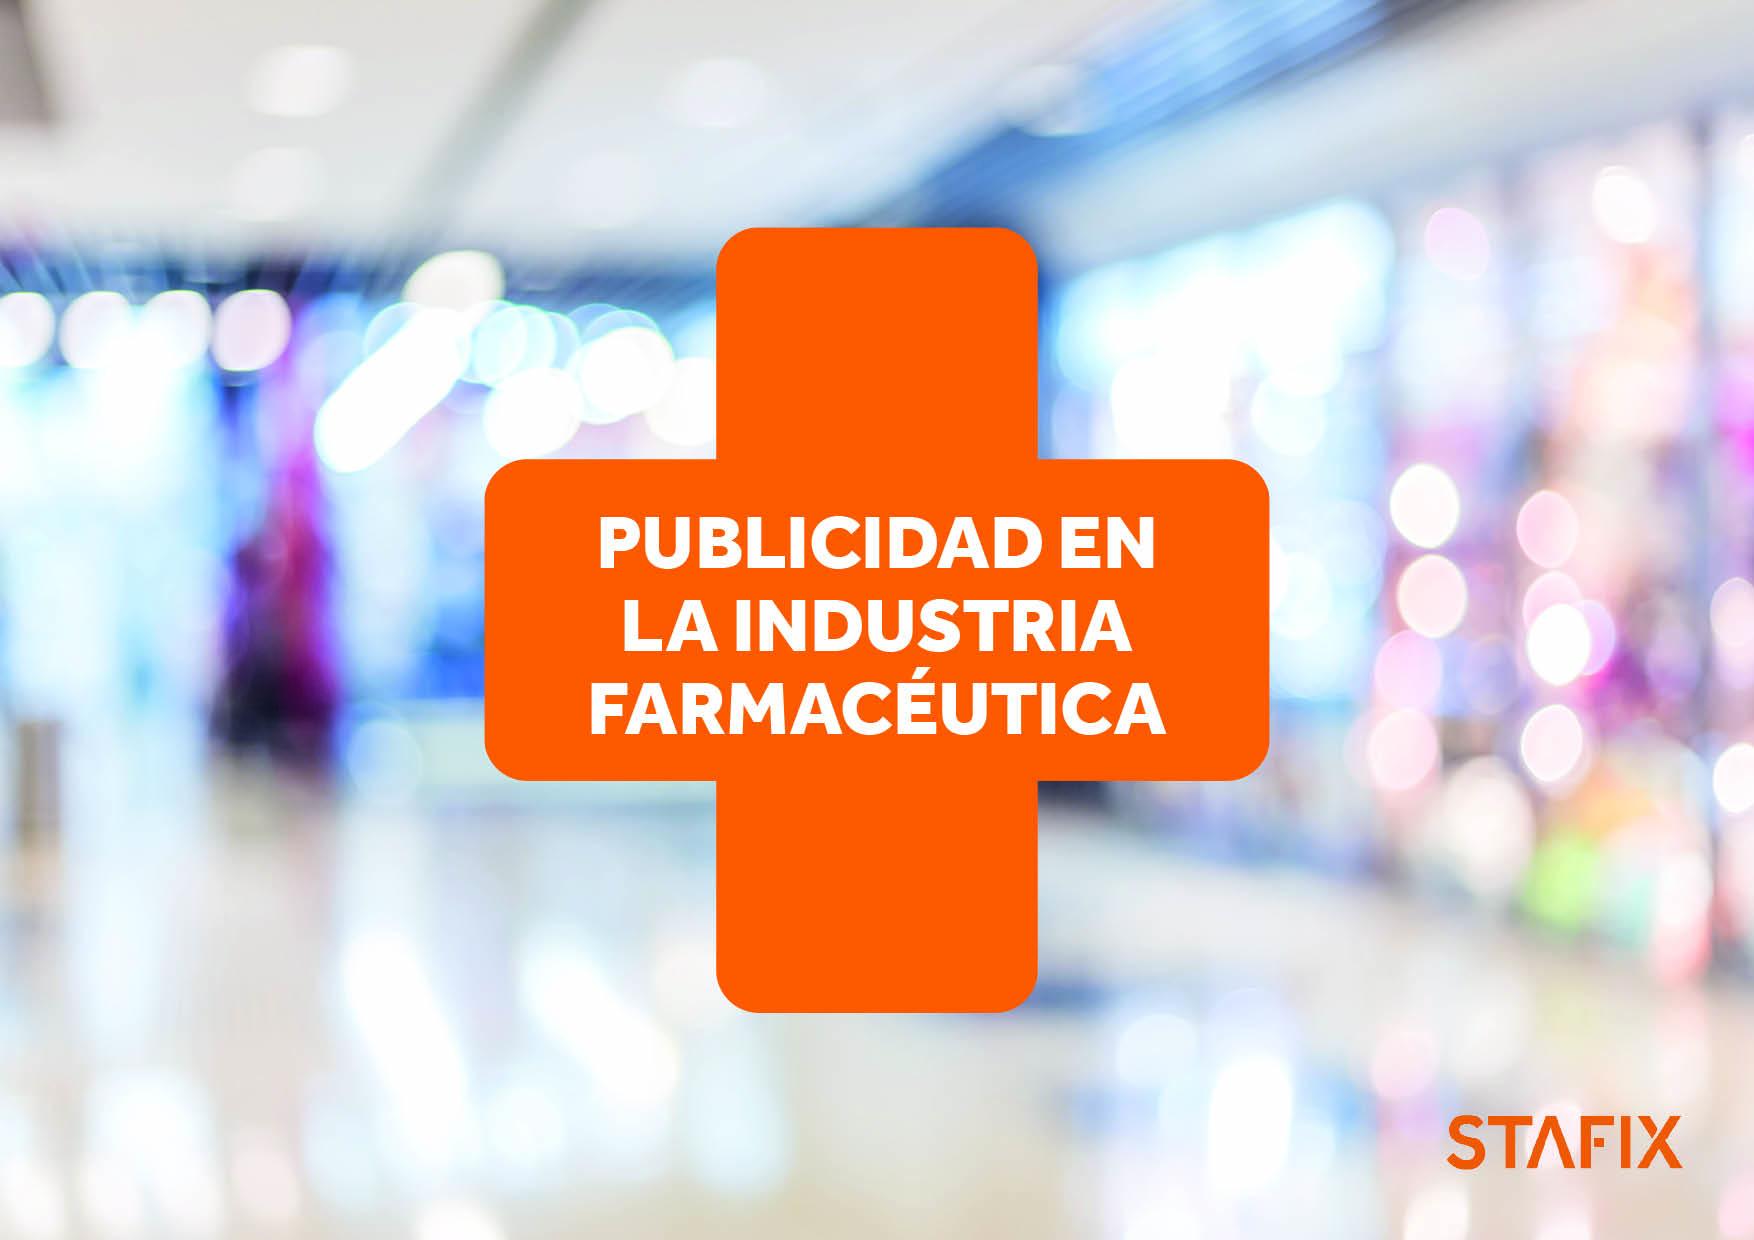 STAFIX_eBOOK_Pharma_1_2018_ES.jpg